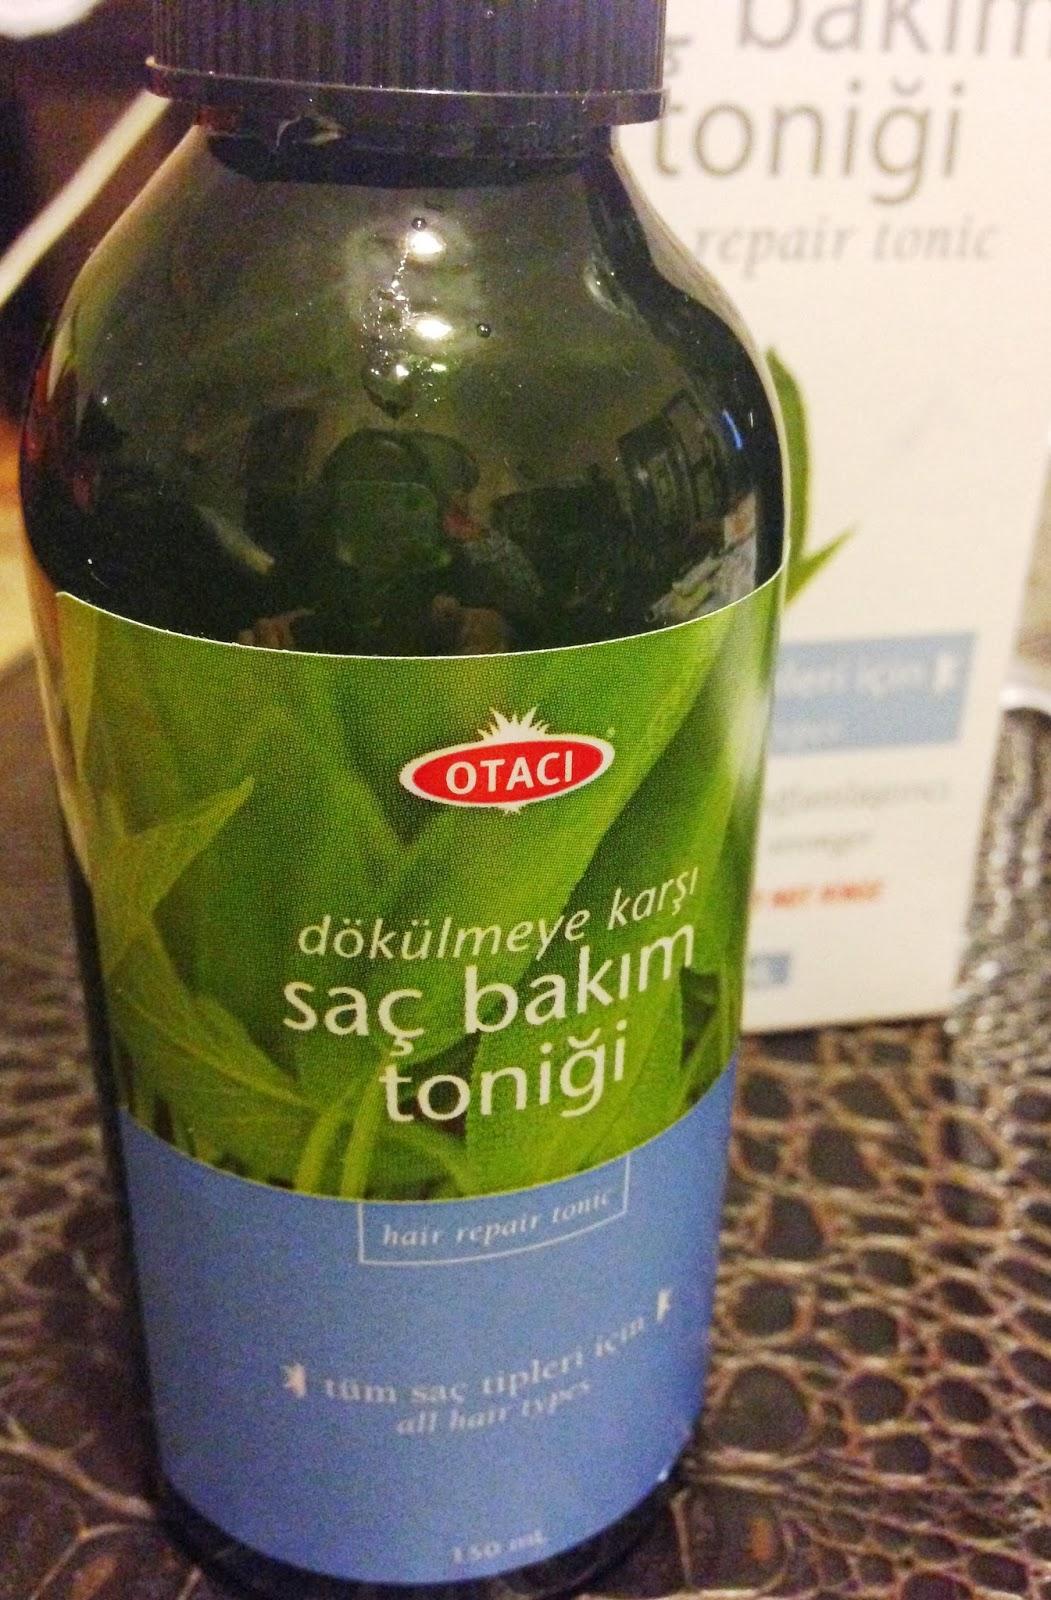 http://sagliklidogalkozmetik.blogspot.com.tr/2014/02/otac-sac-bakm-tonigi-sac-dokulmesine.html